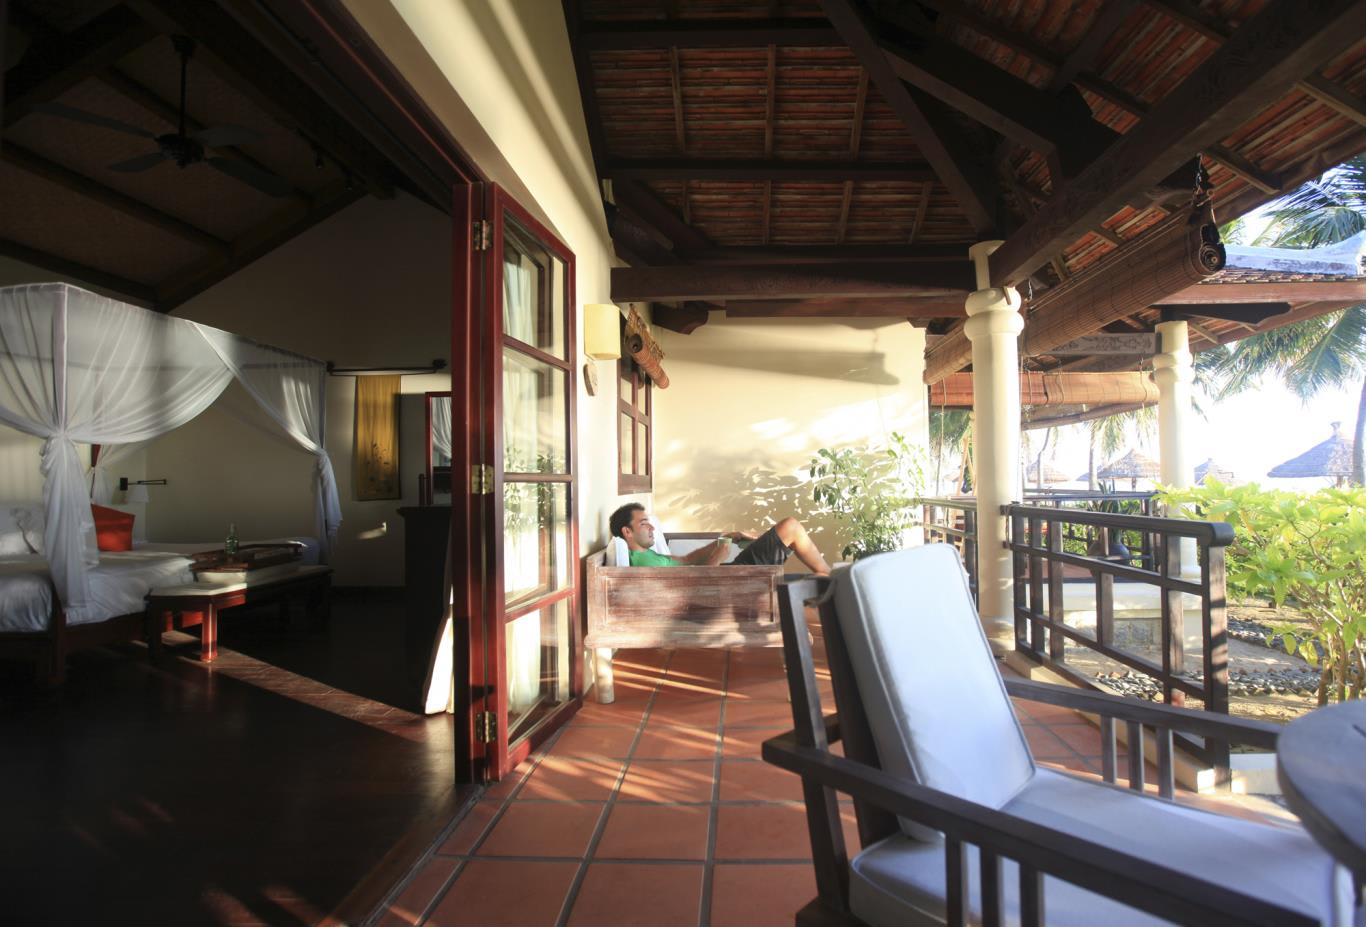 Beachfront Ana Mandara Suite's terrace